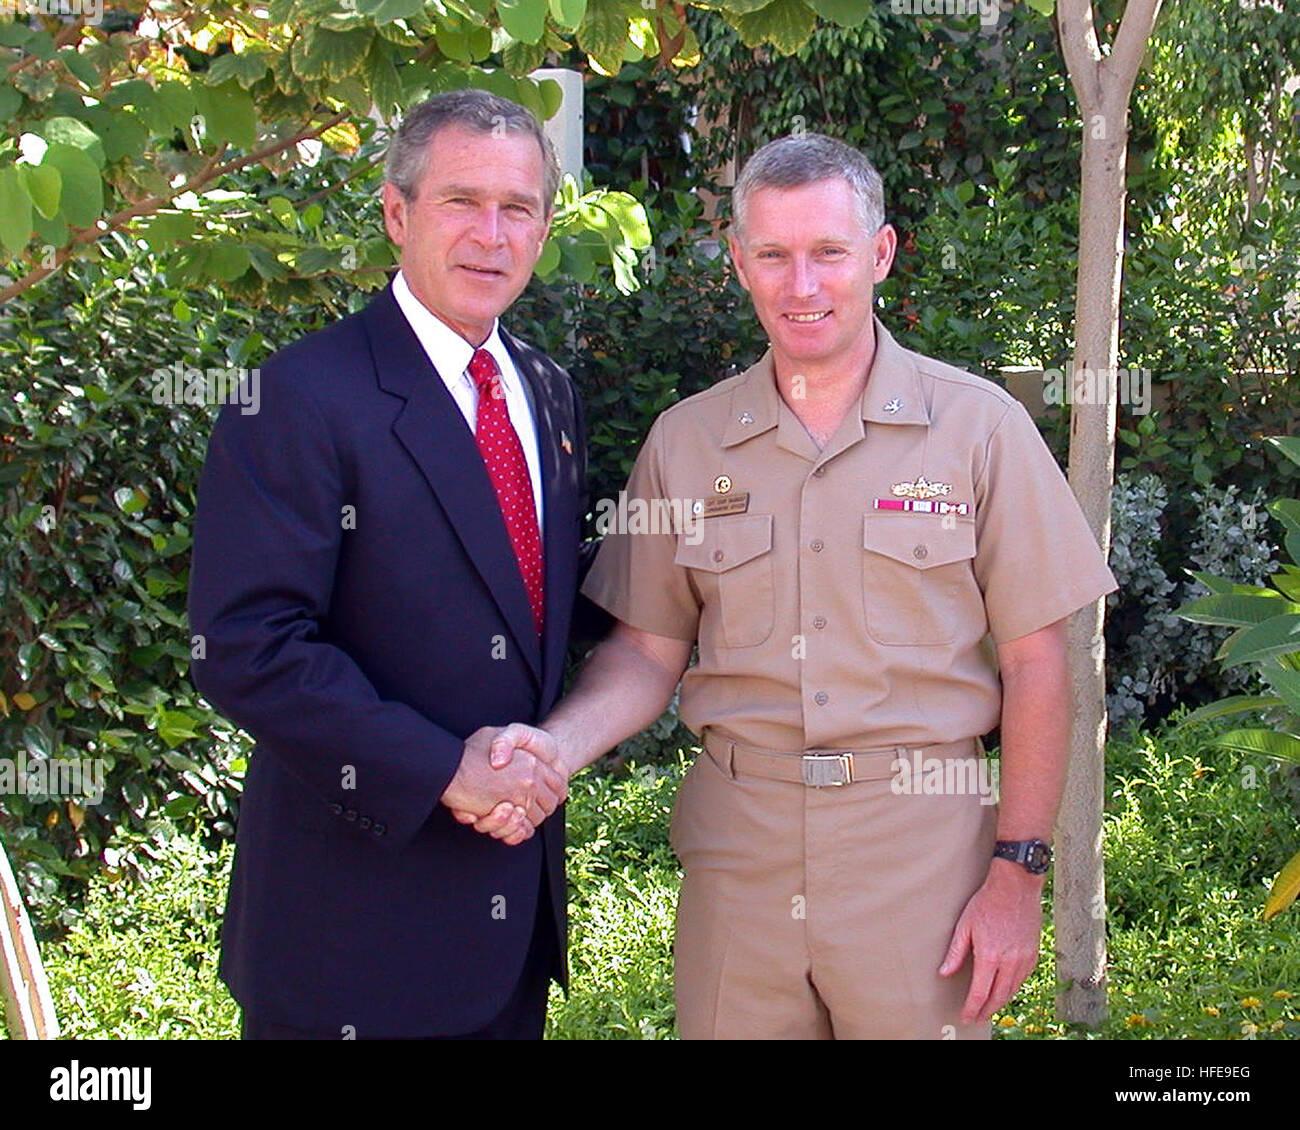 030605-N-0000X-001 Sharm el-Sheik, Egypt (Jun. 5, 2003) -- President George W. Bush congratulates Capt. Terence Stock Photo